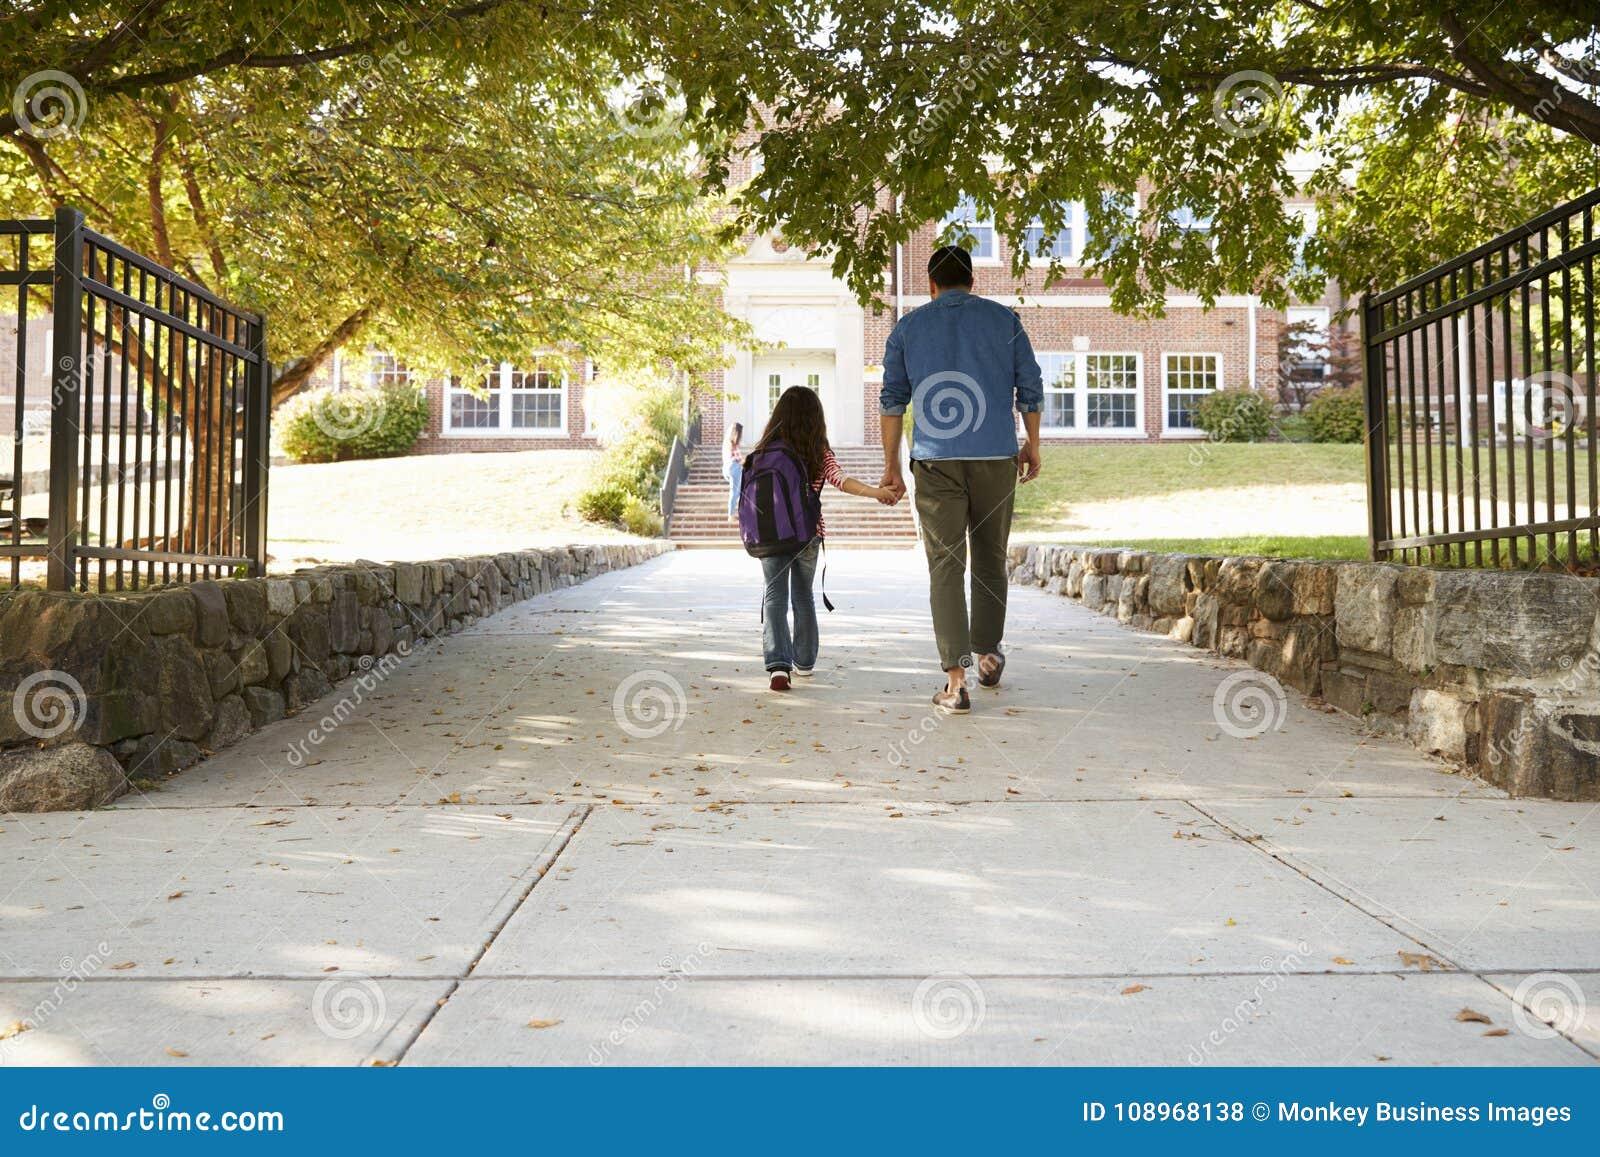 Père Dropping Off Daughter en Front Of School Gates